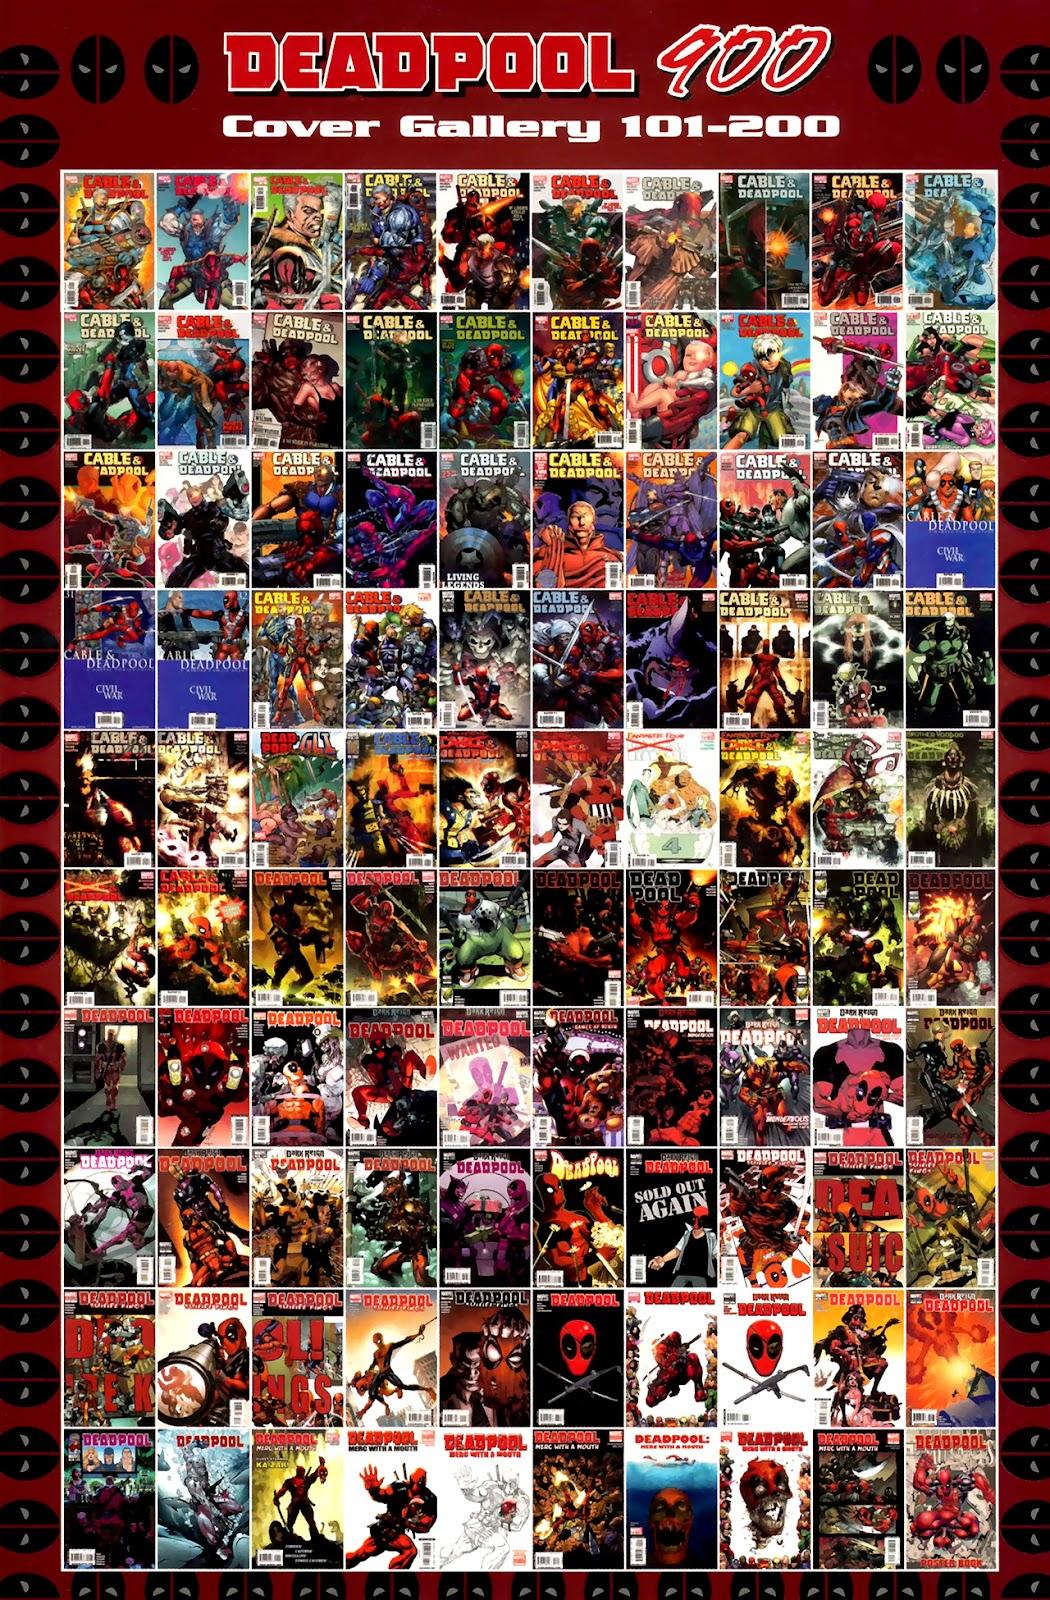 Read online Deadpool (2008) comic -  Issue #900 - 110